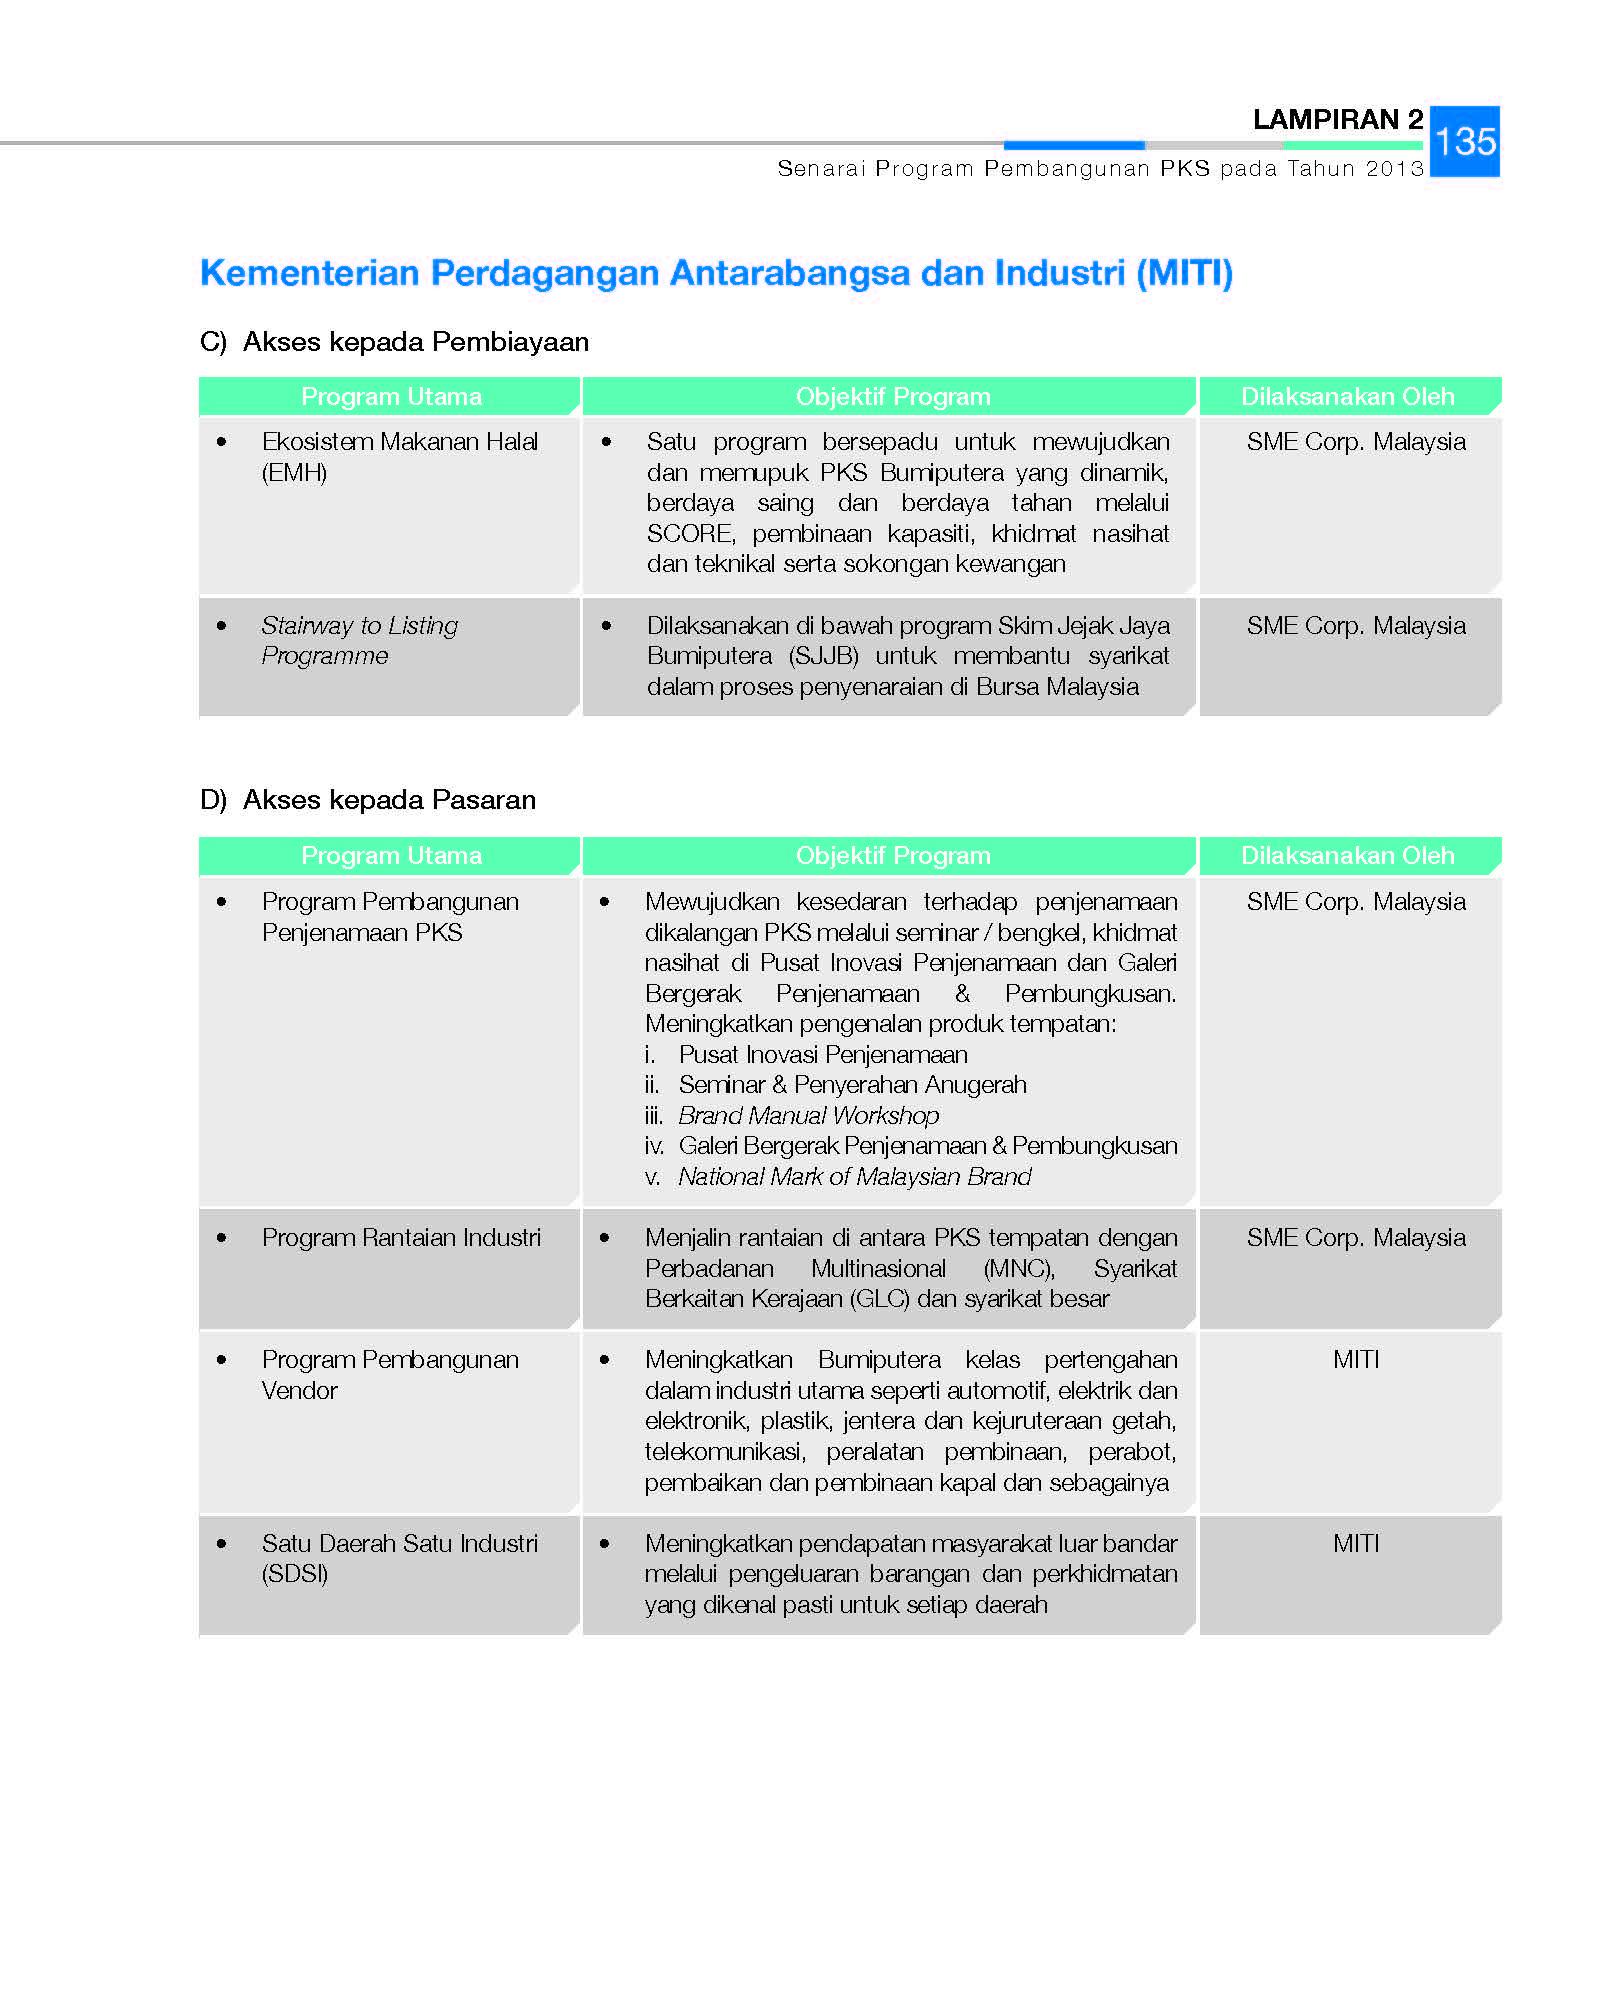 Perbadanan Perusahaan Kecil Dan Sederhana Malaysia Pestech Sdn Bhd